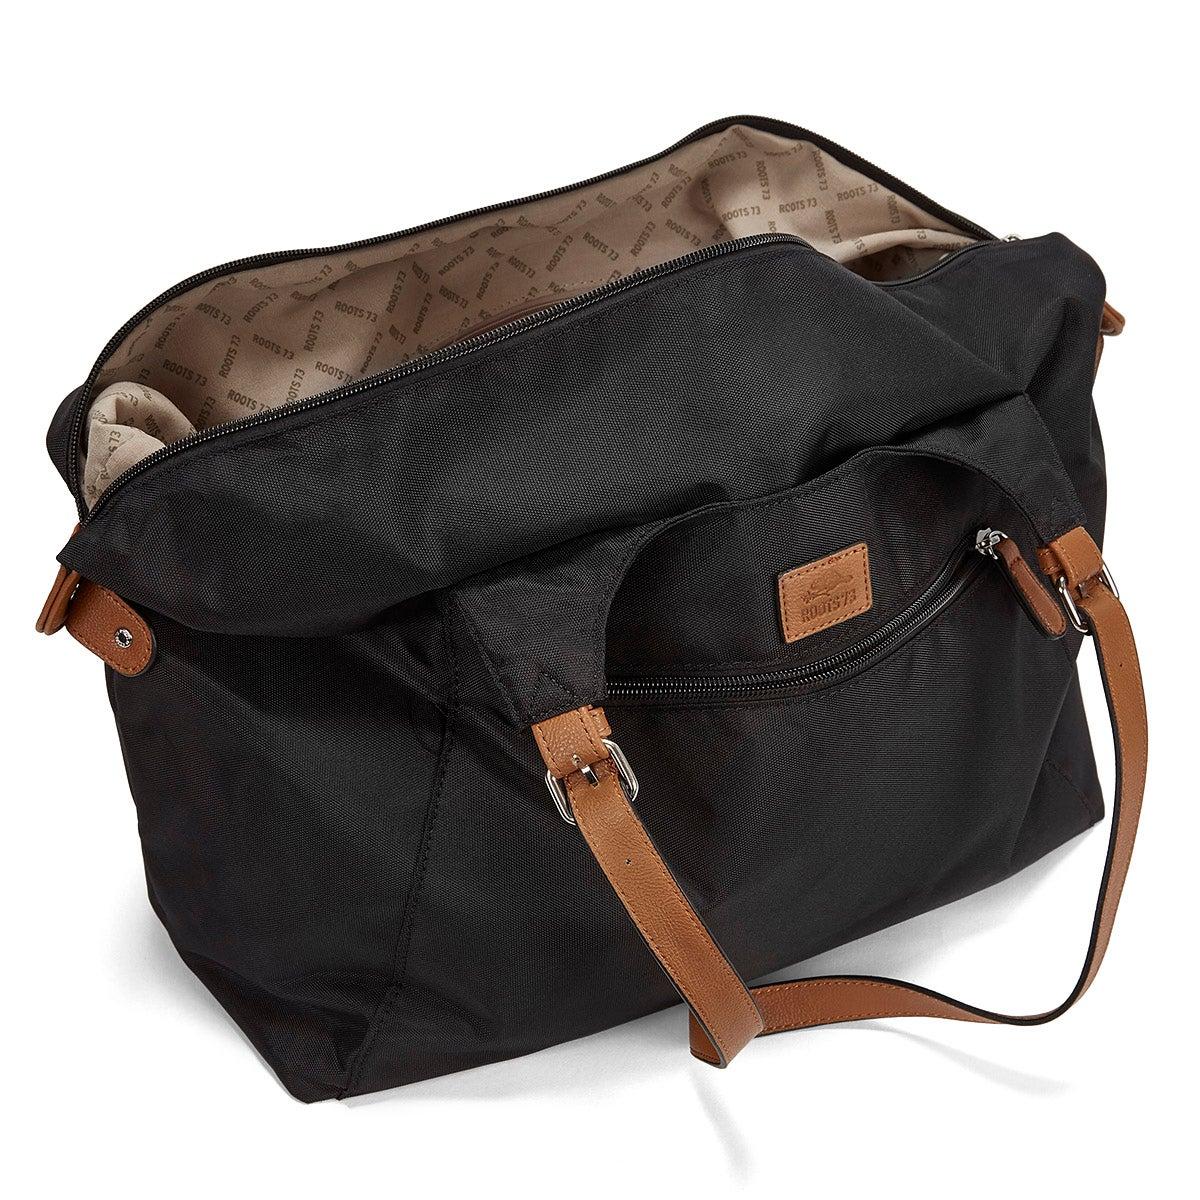 Lds Roots73 black nylon large tote bag